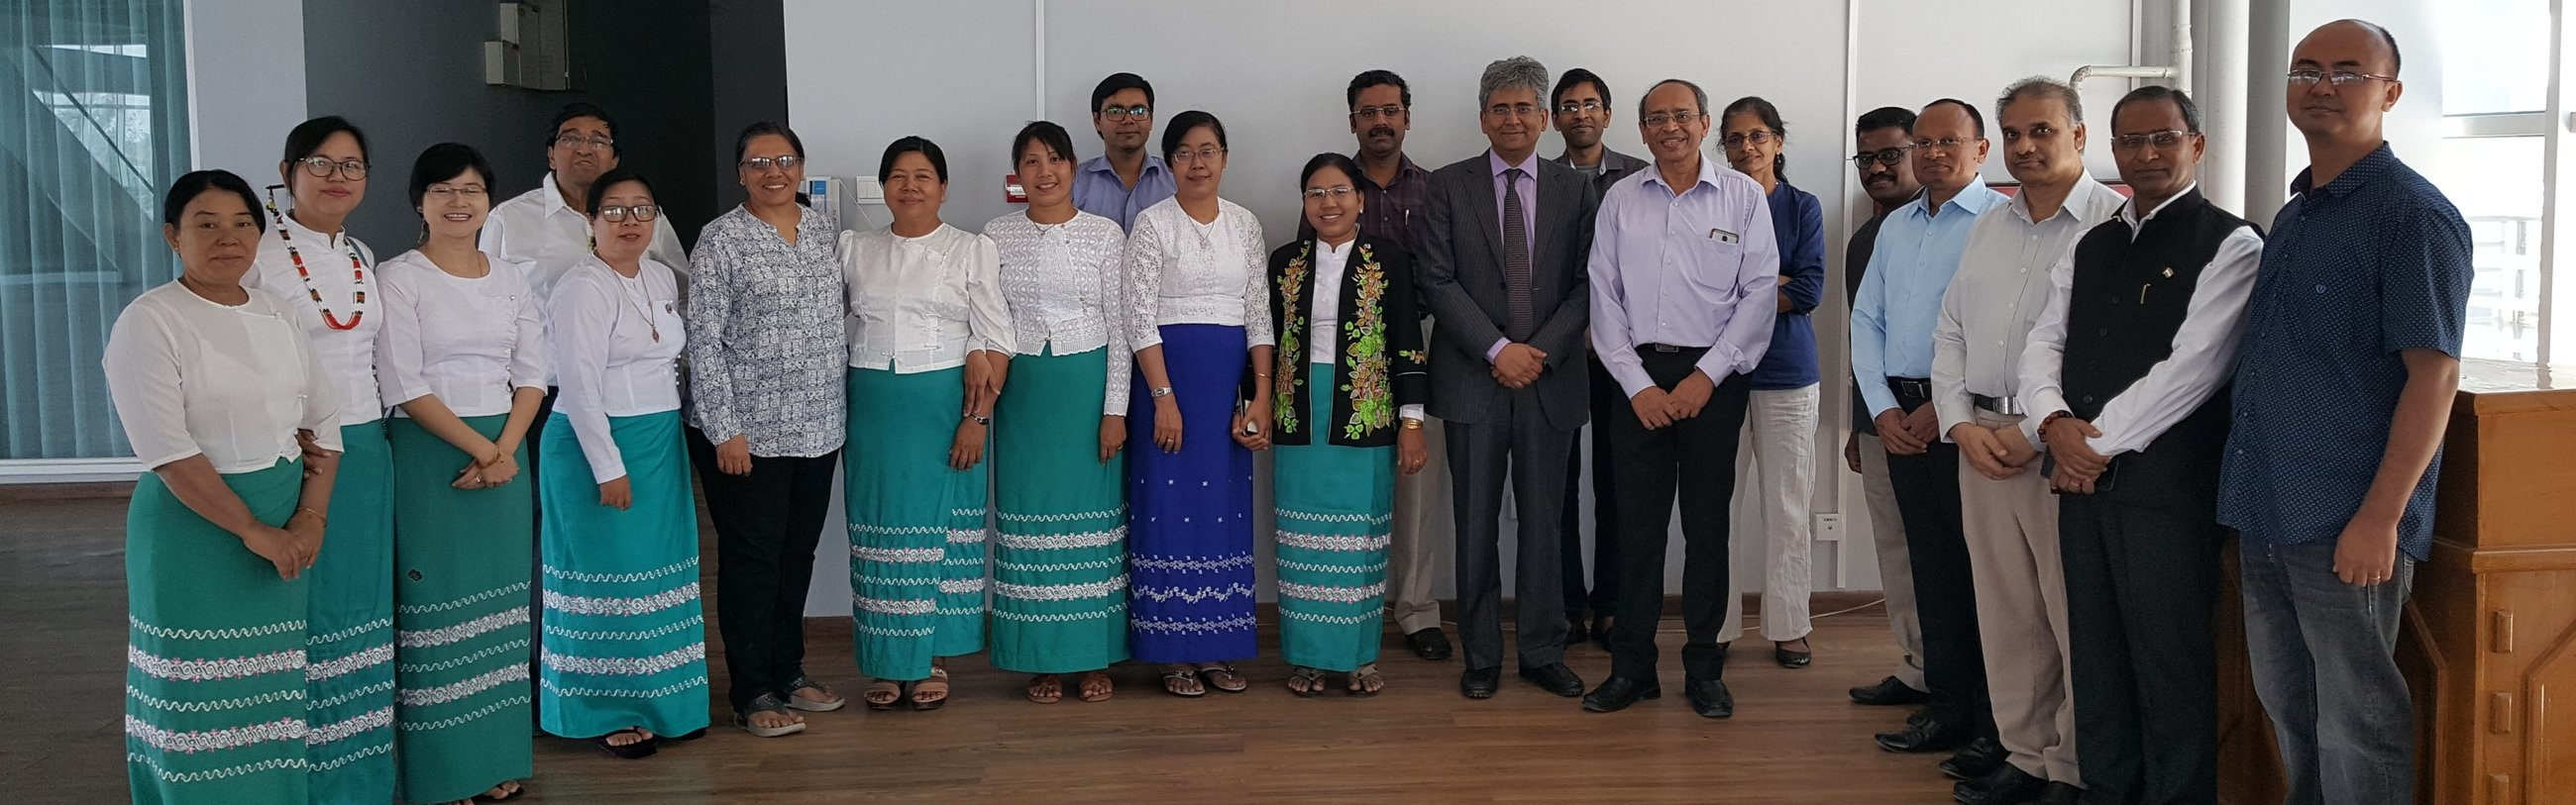 Myanmar Institute of Information Technology | MIIT